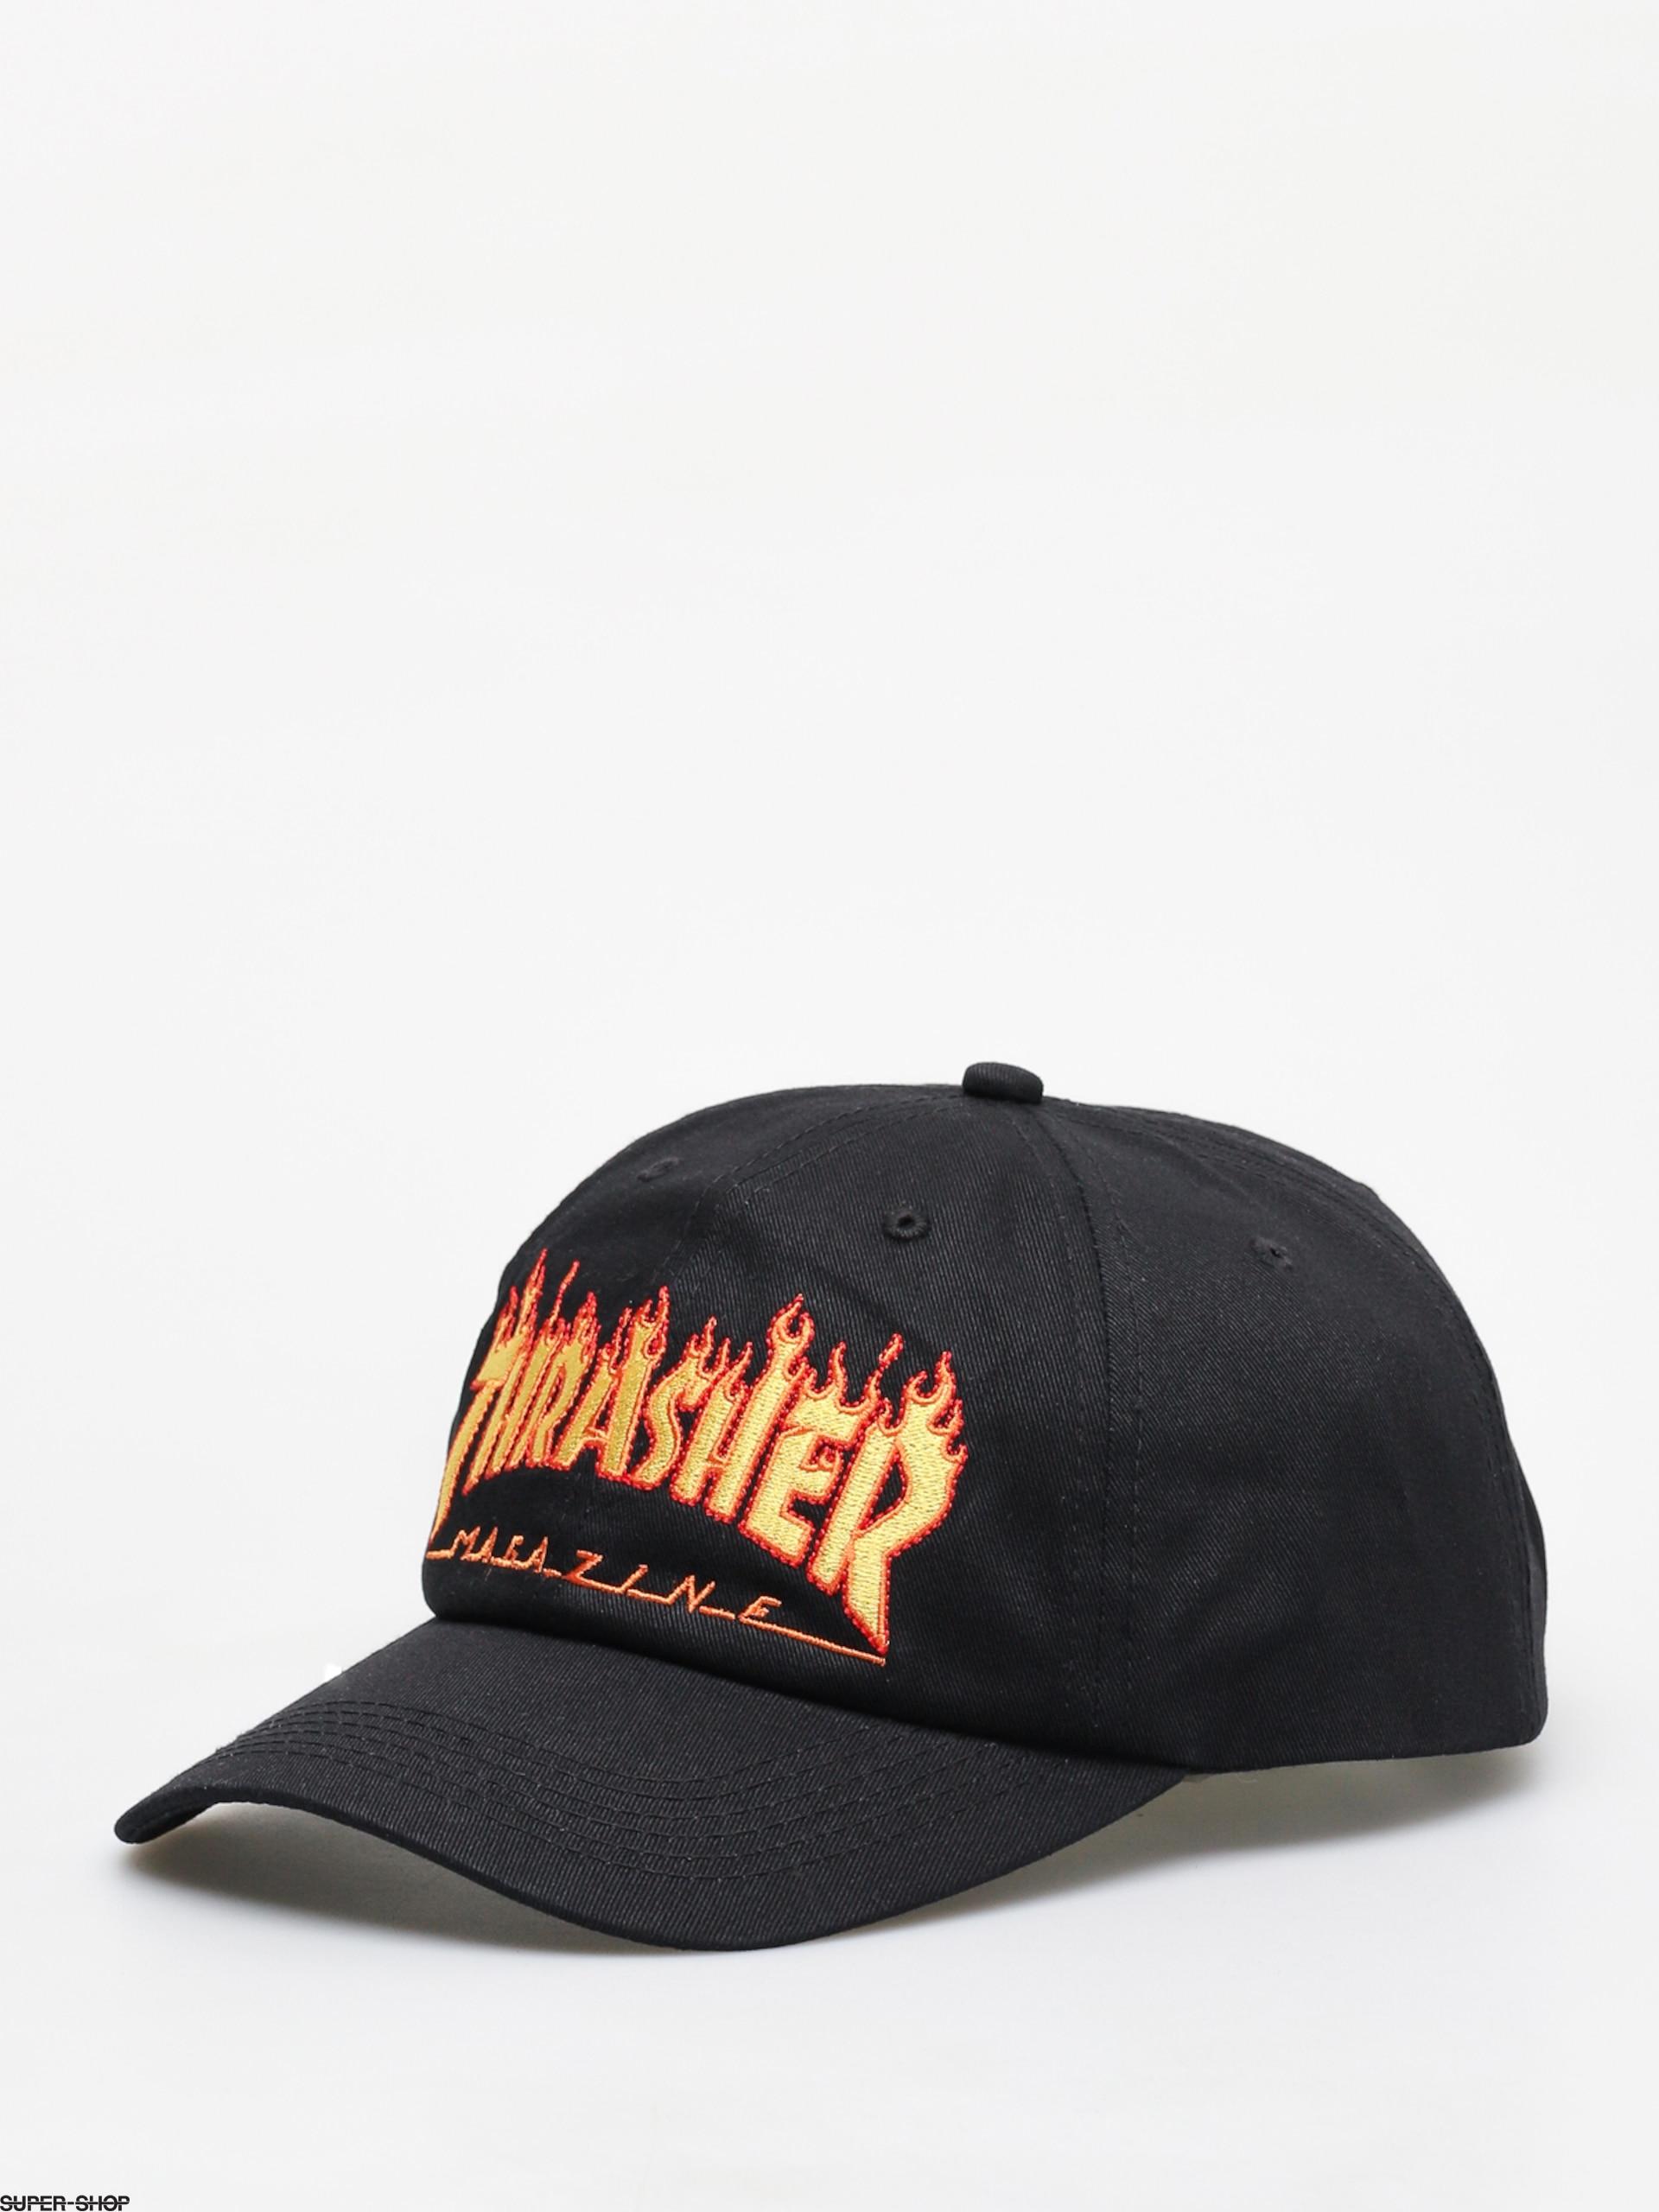 c2c9ecf7a5e ... Pentagram Cross Snapback Mid Profile Mens Independent Hat. THRASHER  snapback trucker hat. 1021215-w1920-thrasher-flame-old-timer-zd-cap-black .jpg